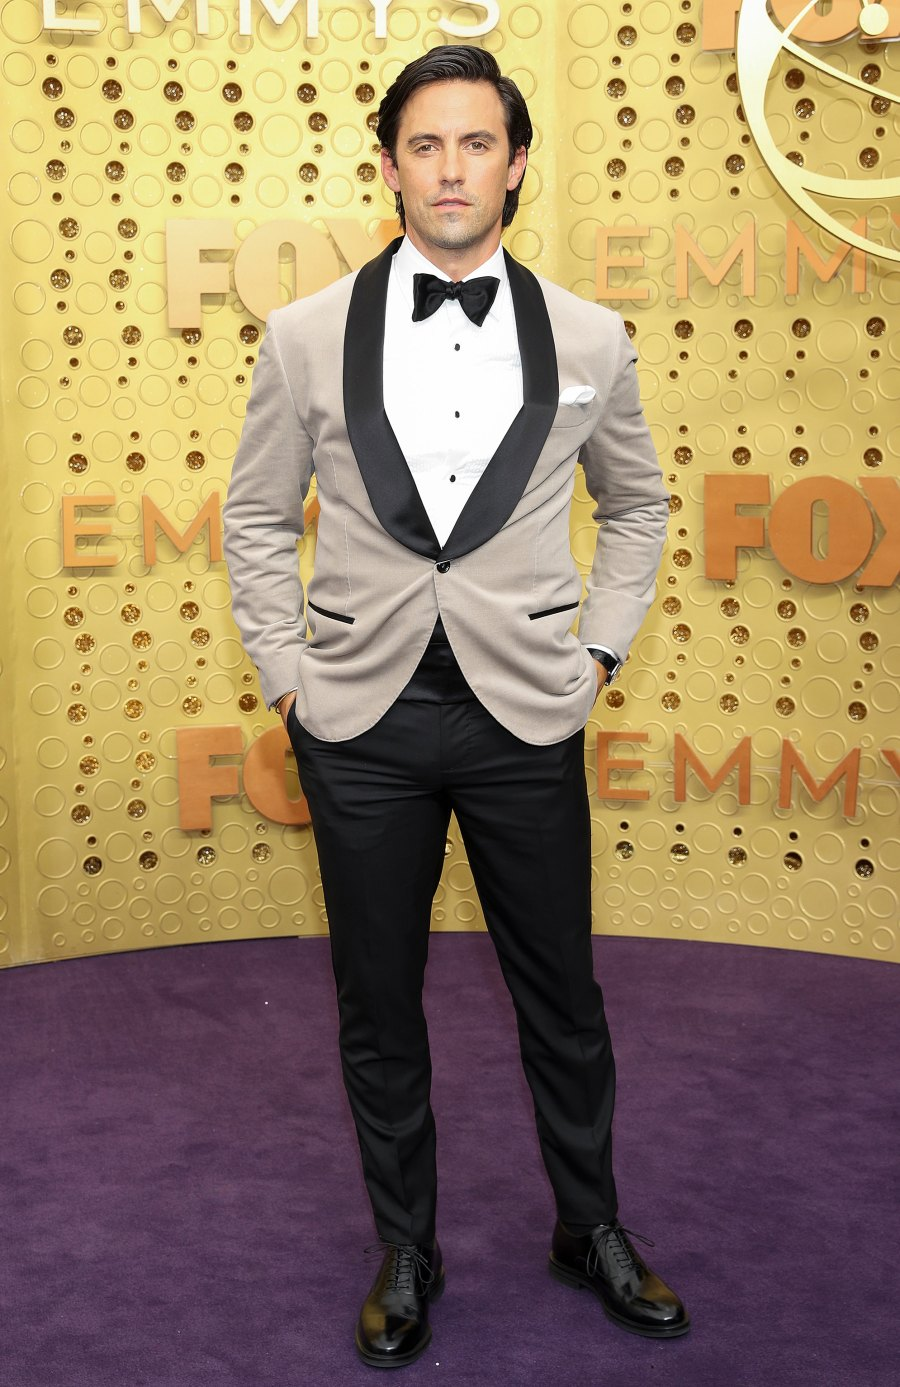 Emmys 2019 Hottest Hunks - Milo Ventimiglia